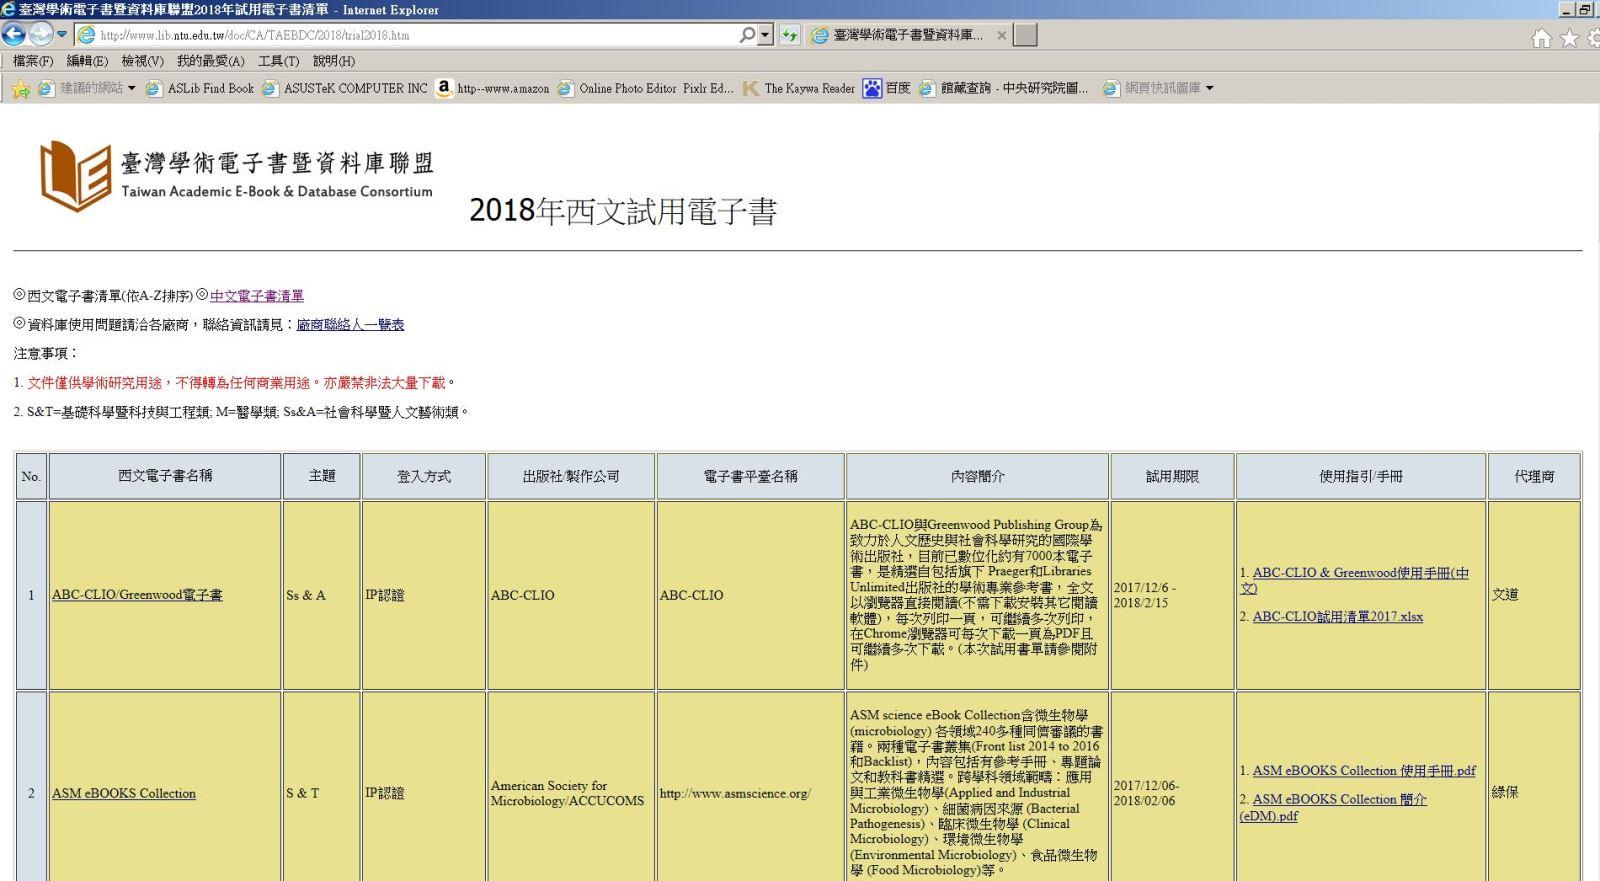 2018 Taiwan Acdemic E-book & Database Consortium